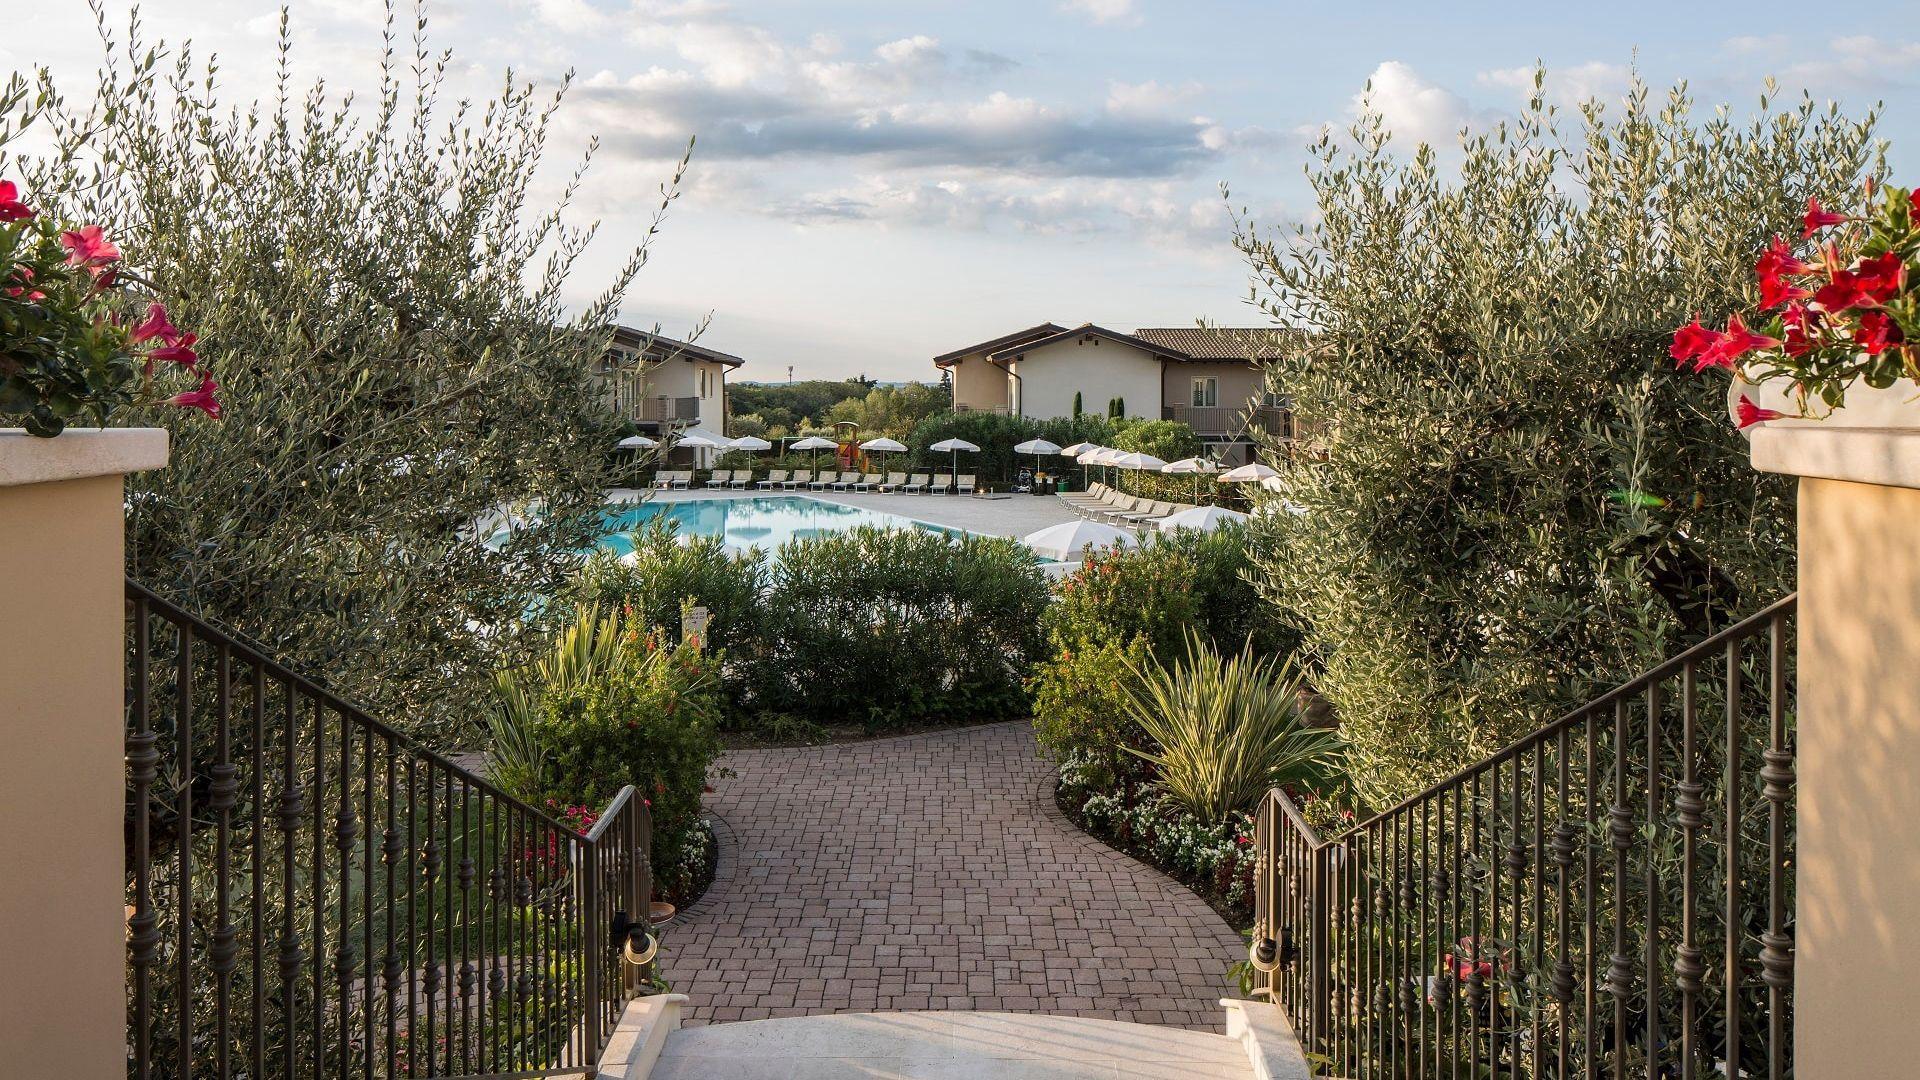 4* Hotel Lake Garda